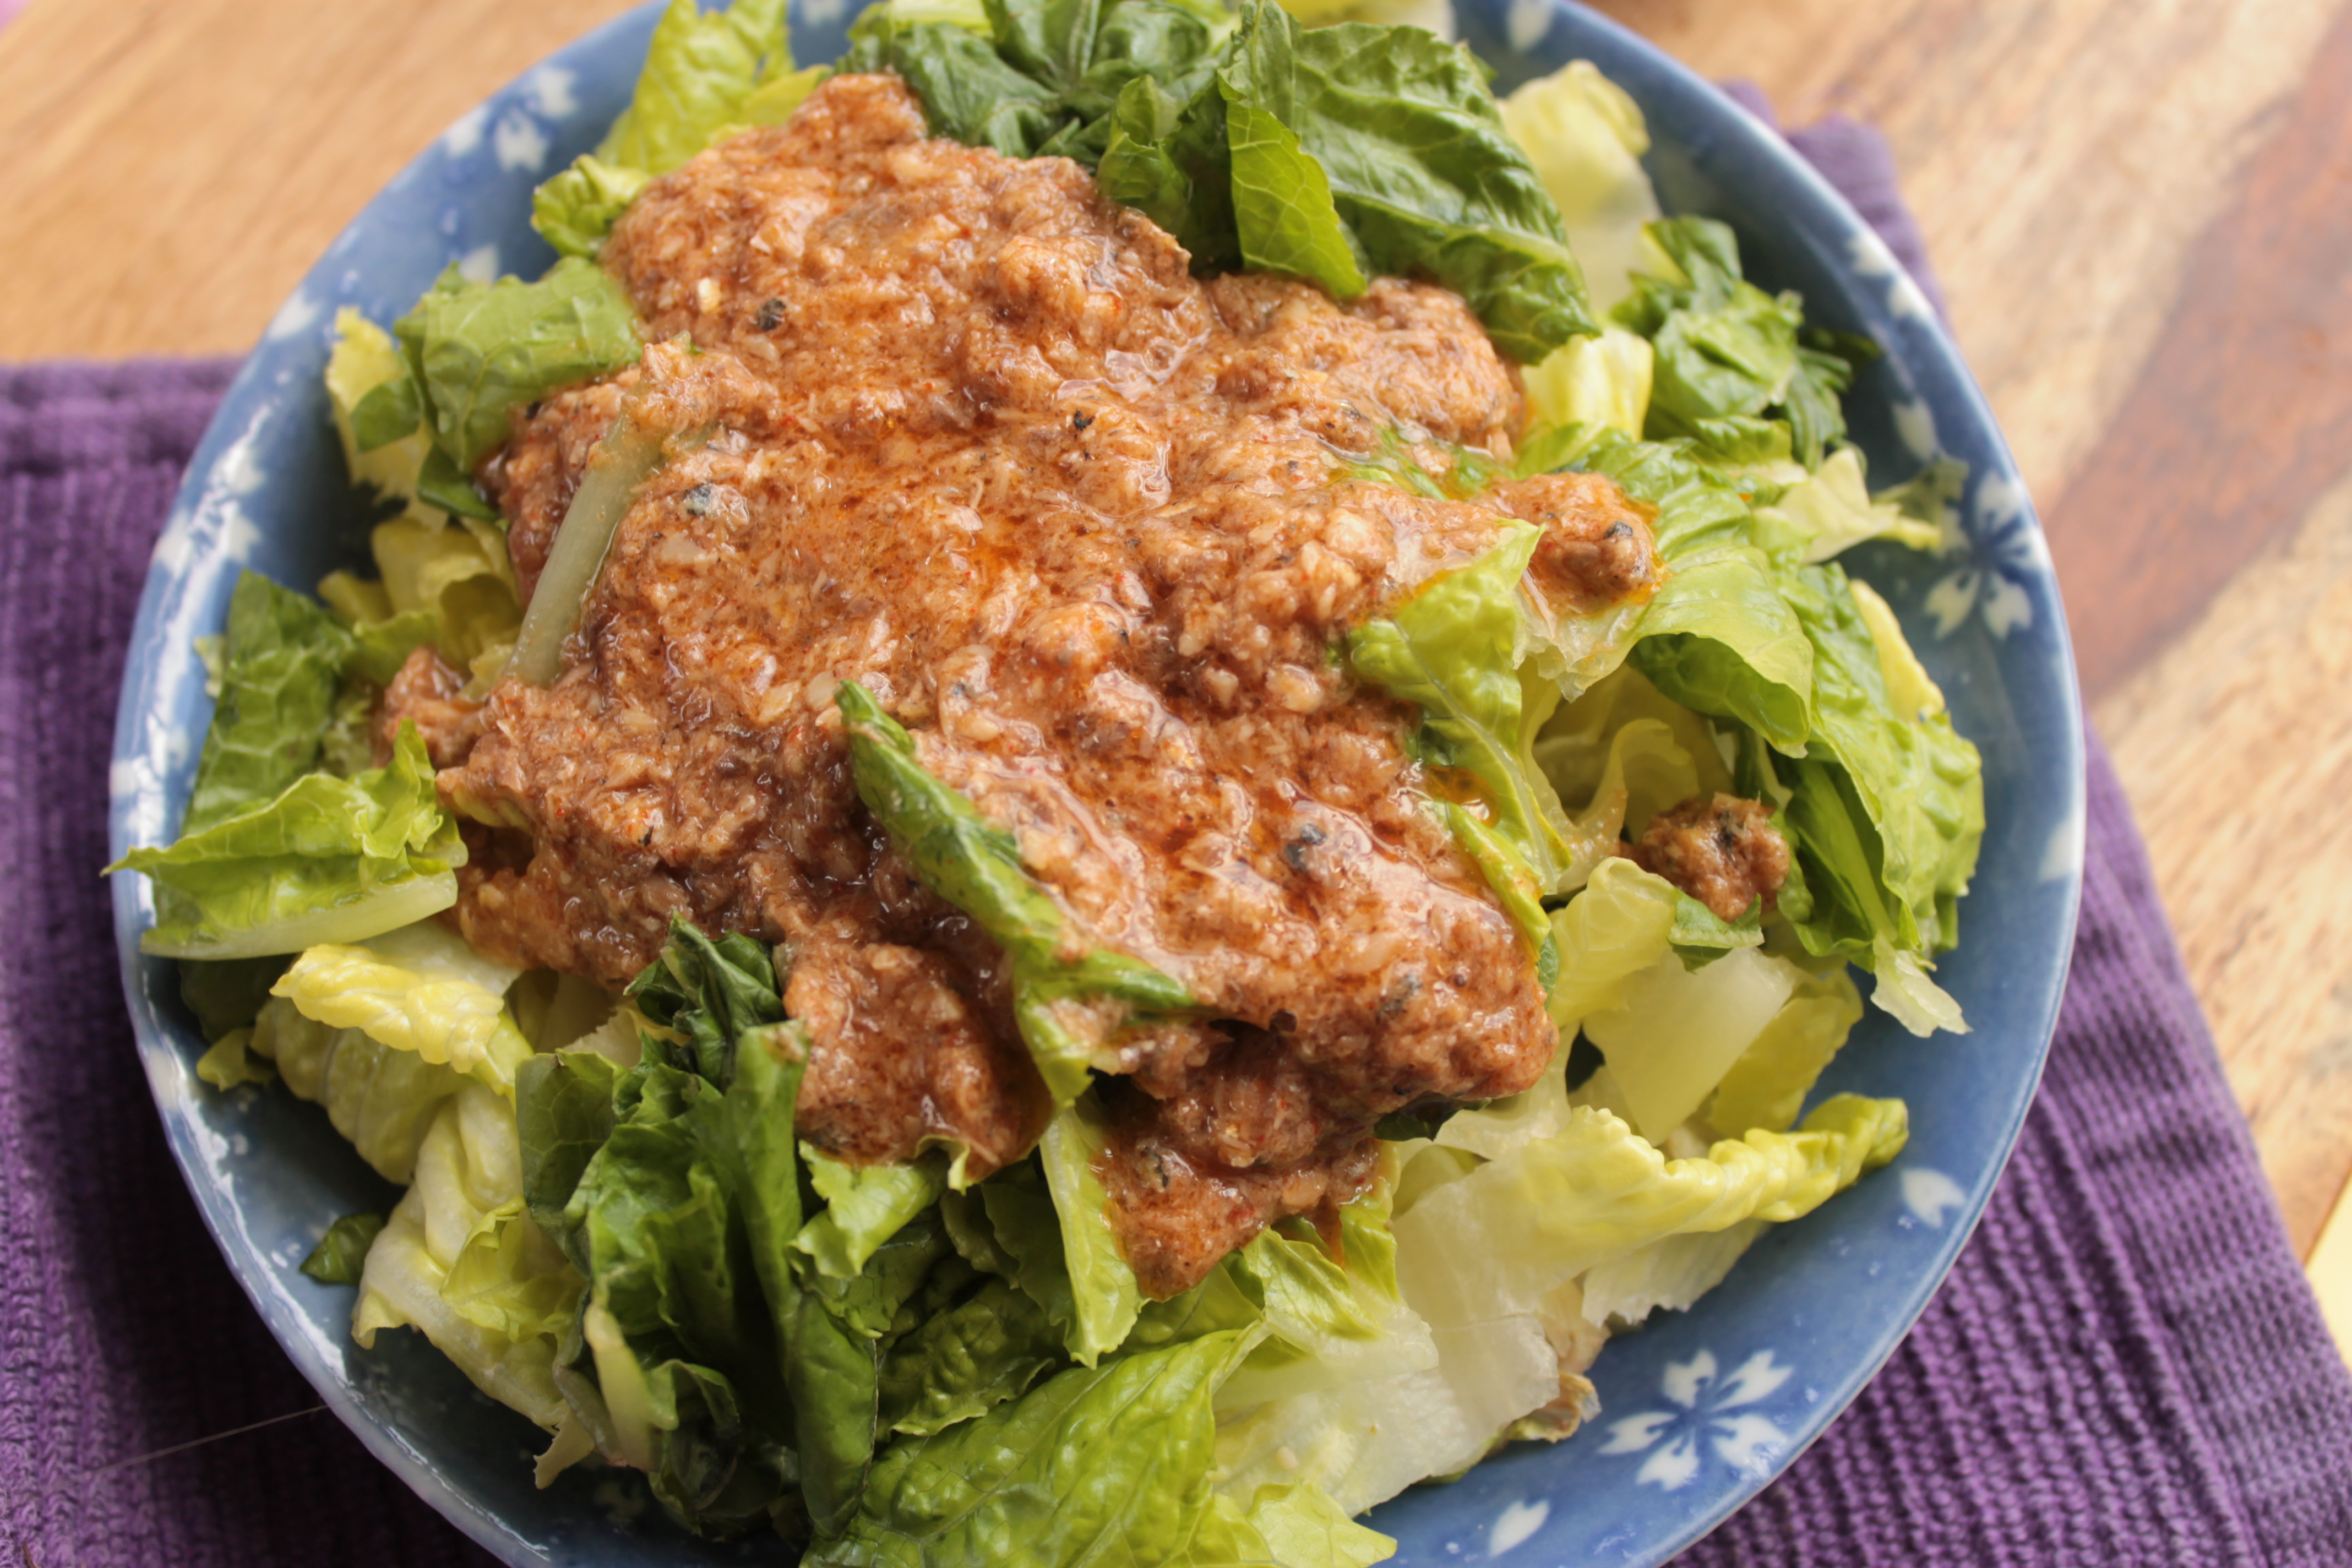 Sardine salad dressing